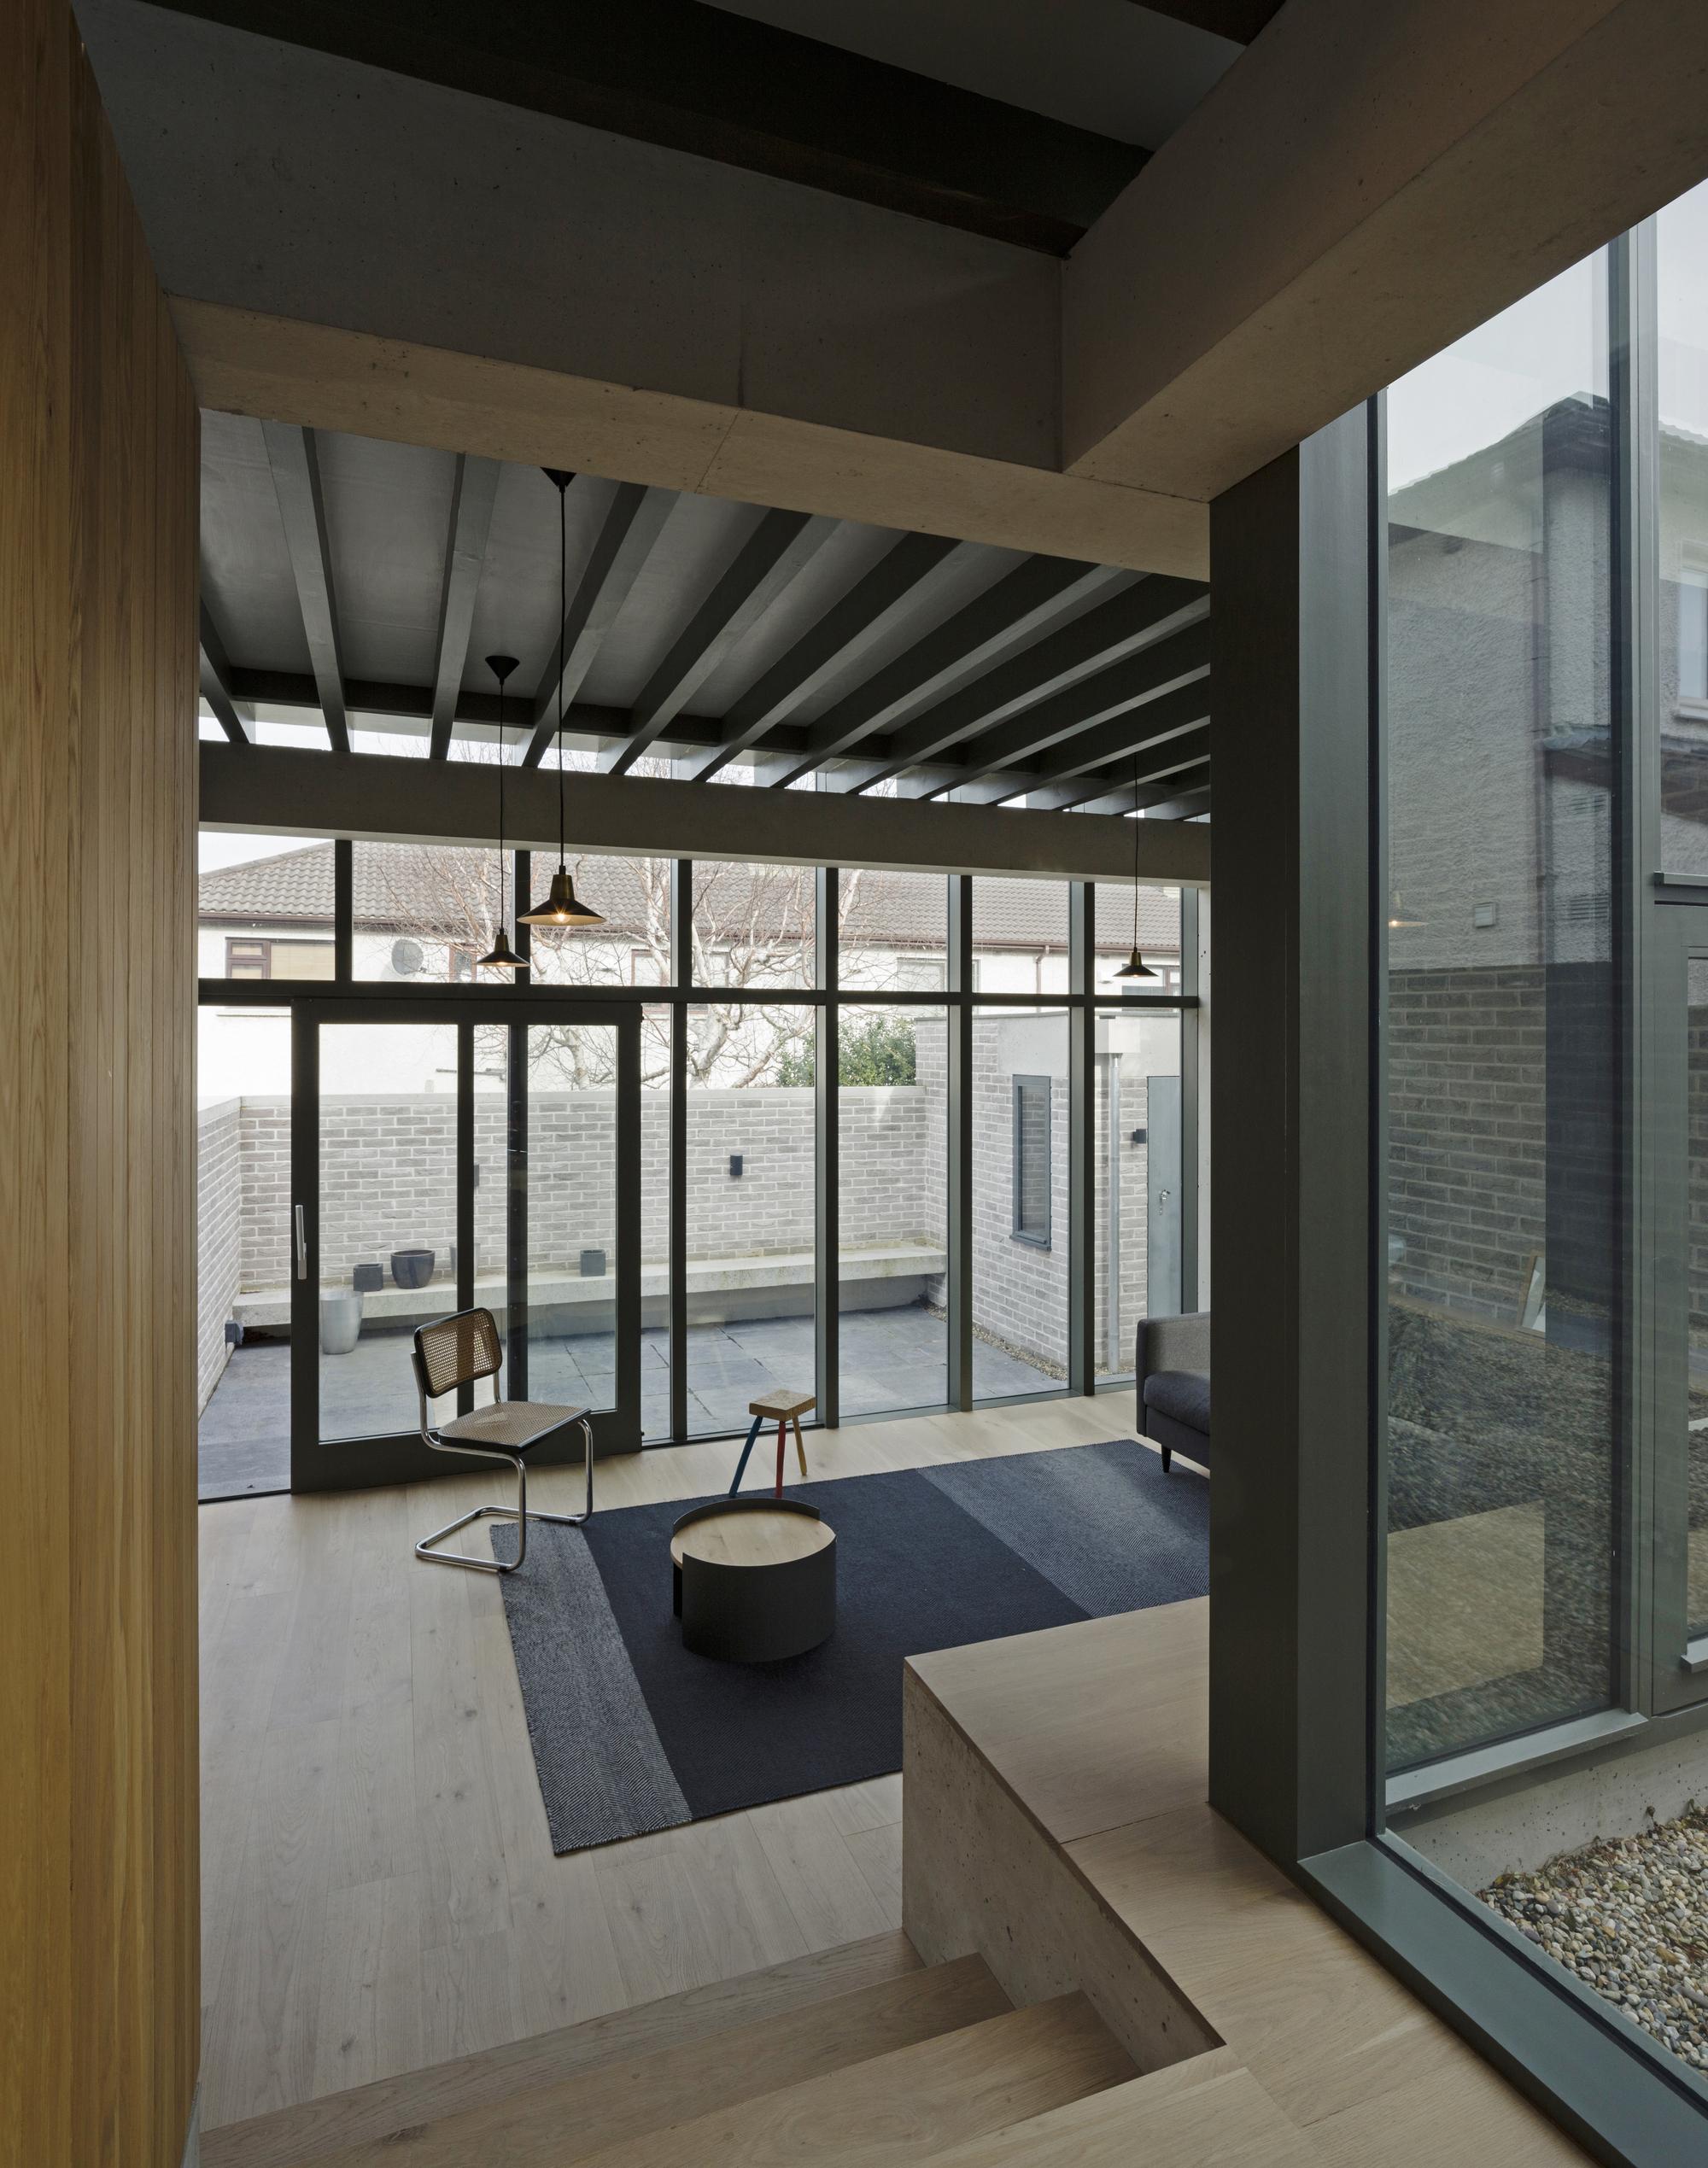 St. Augustine Park / Donal Colfer Architects